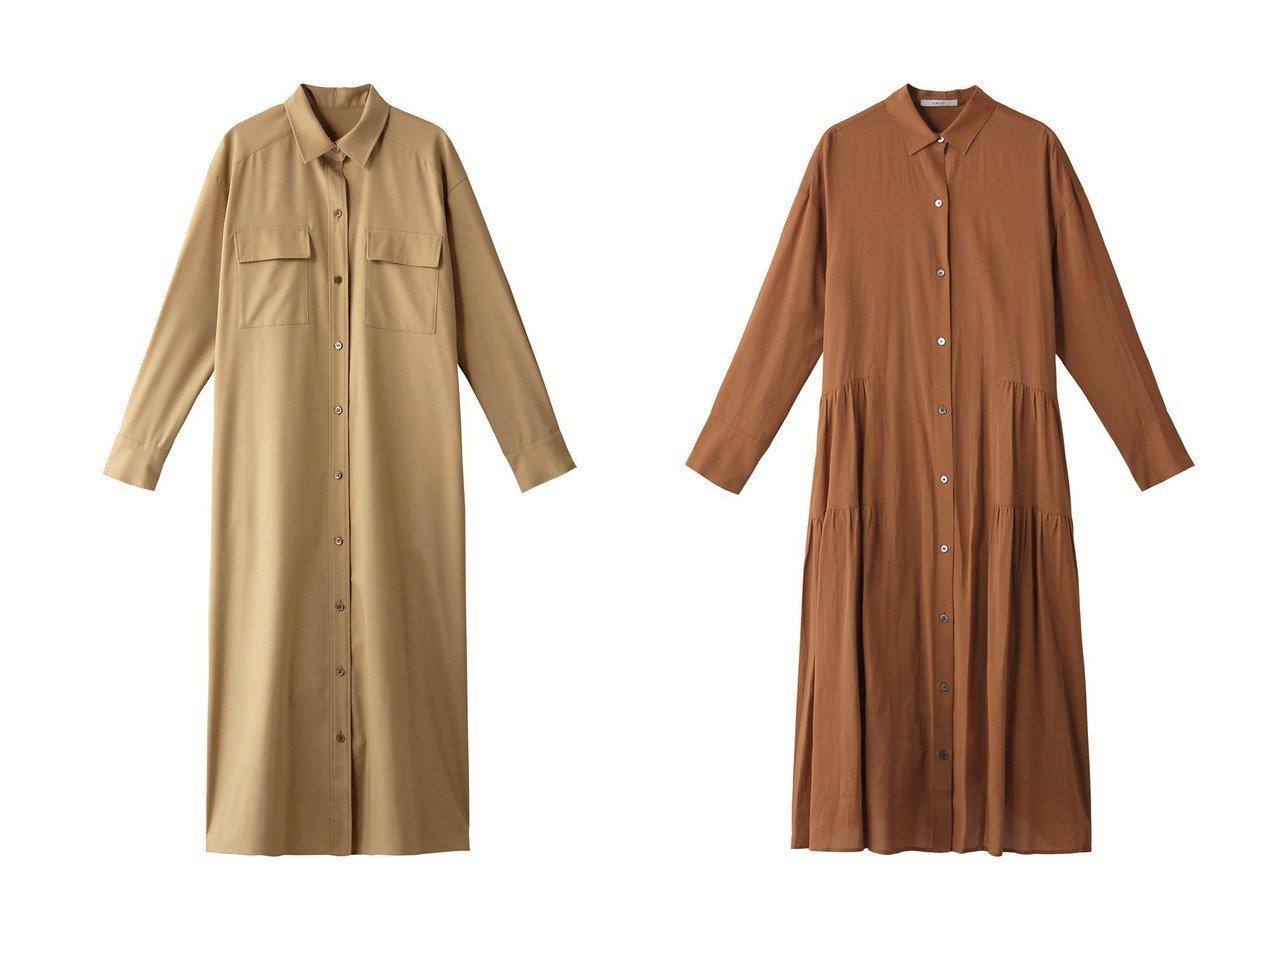 【ANAYI/アナイ】のカルゼストレッチシャツワンピース&キュプラツイルギャザーシャツワンピース ワンピース・ドレスのおすすめ!人気、トレンド・レディースファッションの通販 おすすめで人気の流行・トレンド、ファッションの通販商品 メンズファッション・キッズファッション・インテリア・家具・レディースファッション・服の通販 founy(ファニー) https://founy.com/ ファッション Fashion レディースファッション WOMEN ワンピース Dress シャツワンピース Shirt Dresses ストレッチ ロング 今季 羽織 ギャザー フェミニン フォルム  ID:crp329100000011936